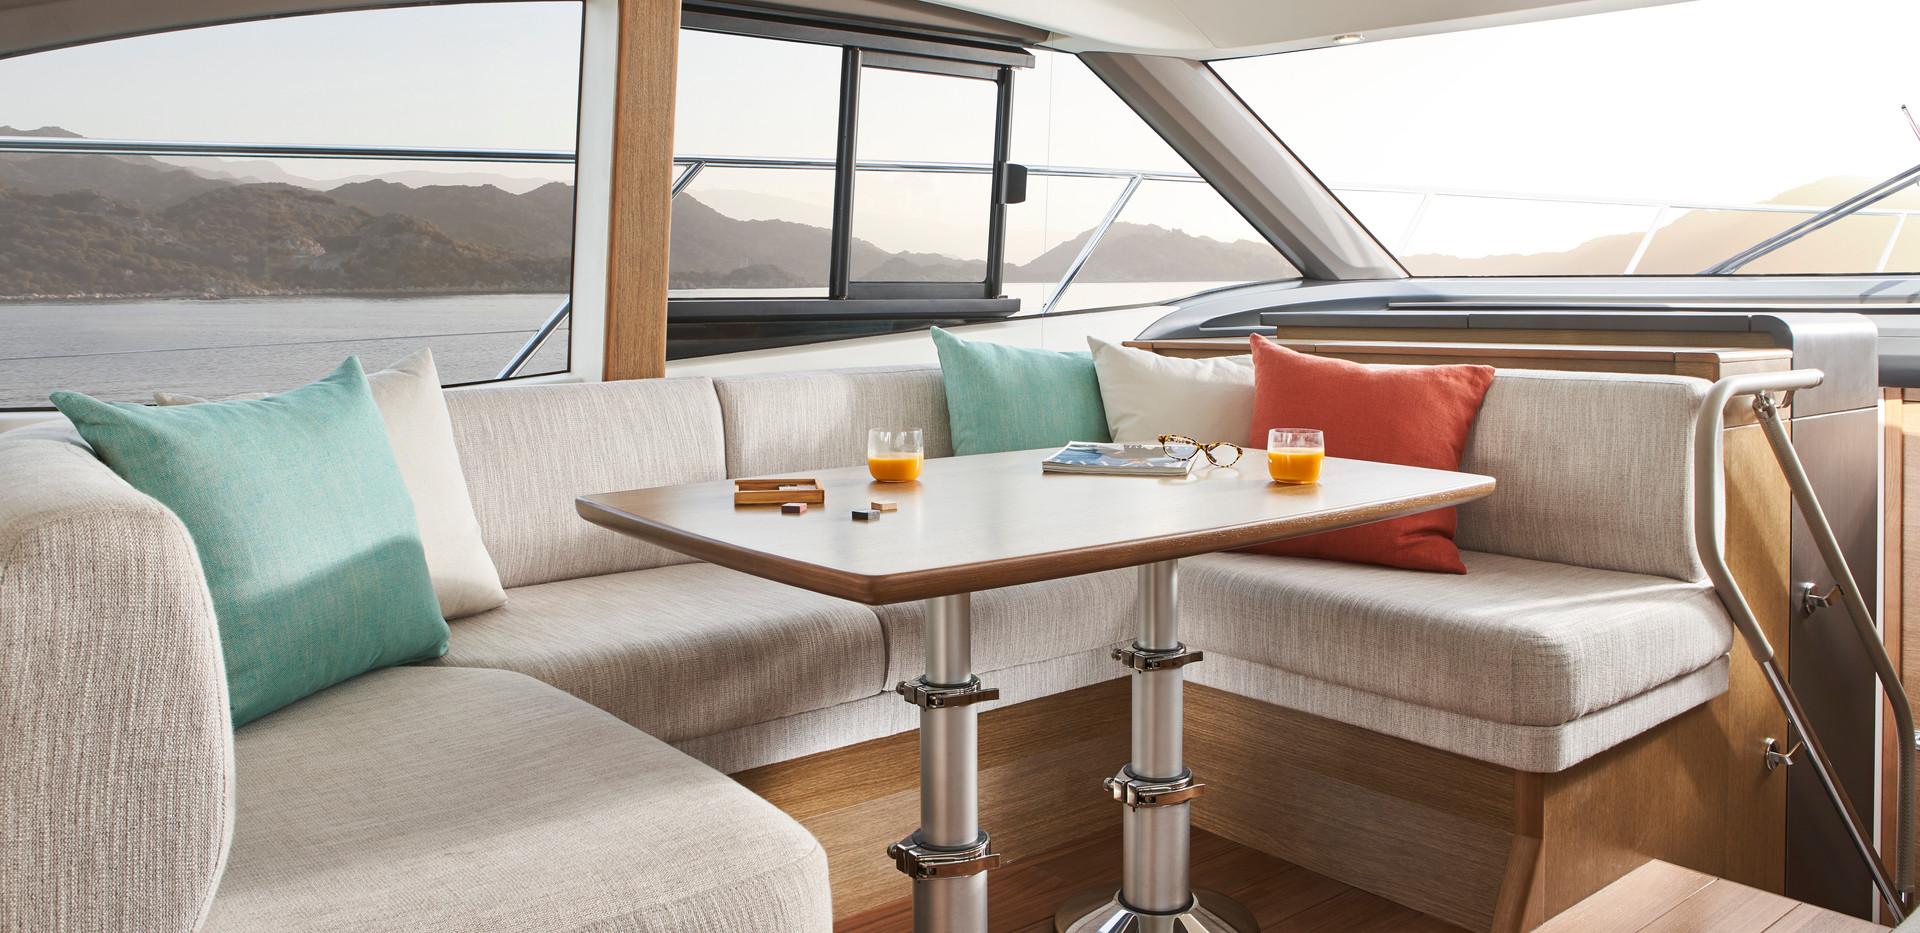 f45-interior-saloon-seating-rovere-oak-s